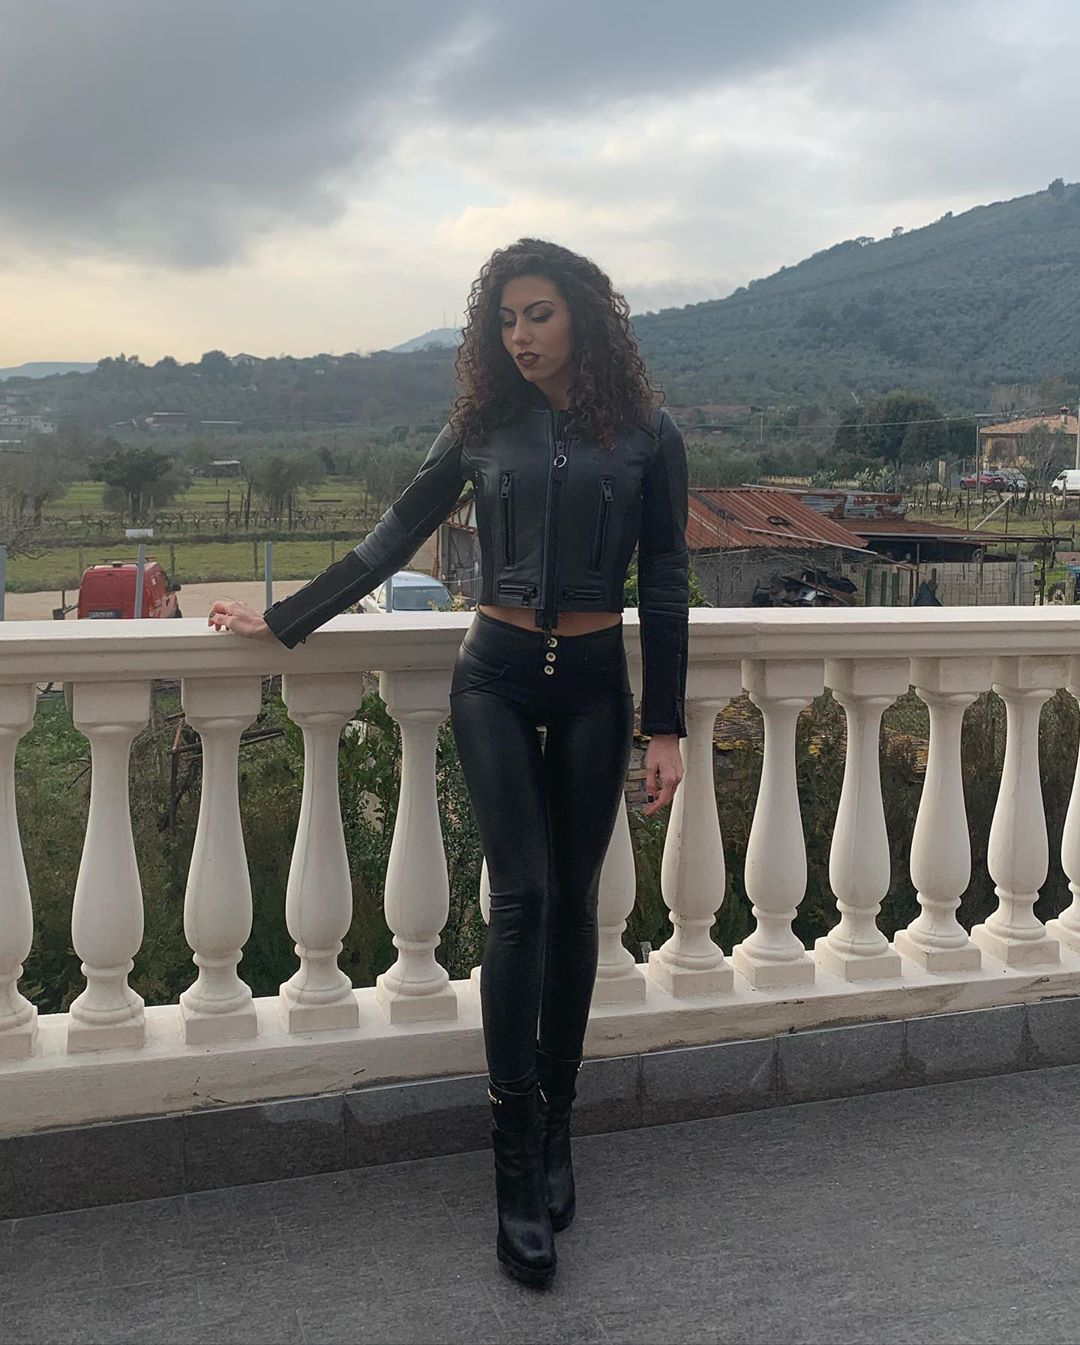 Sara-Quattrociocche-Wallpapers-Insta-Fit-Bio-1